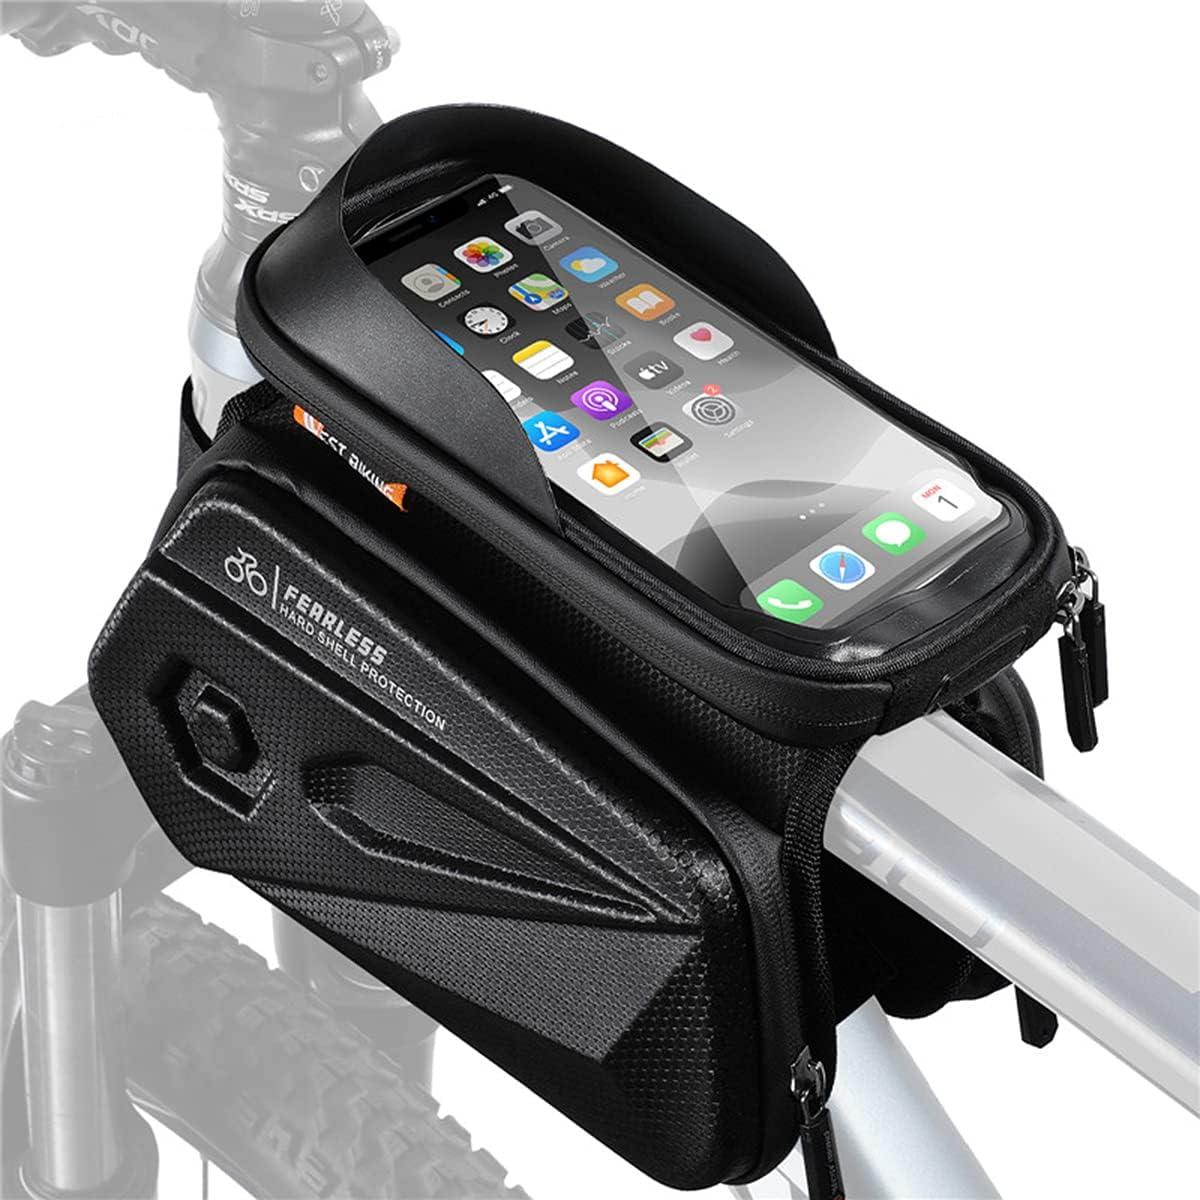 GELEI Bike SALENEW very popular Max 46% OFF Bag Waterproof Top Frame Mountai Front Phone Tube